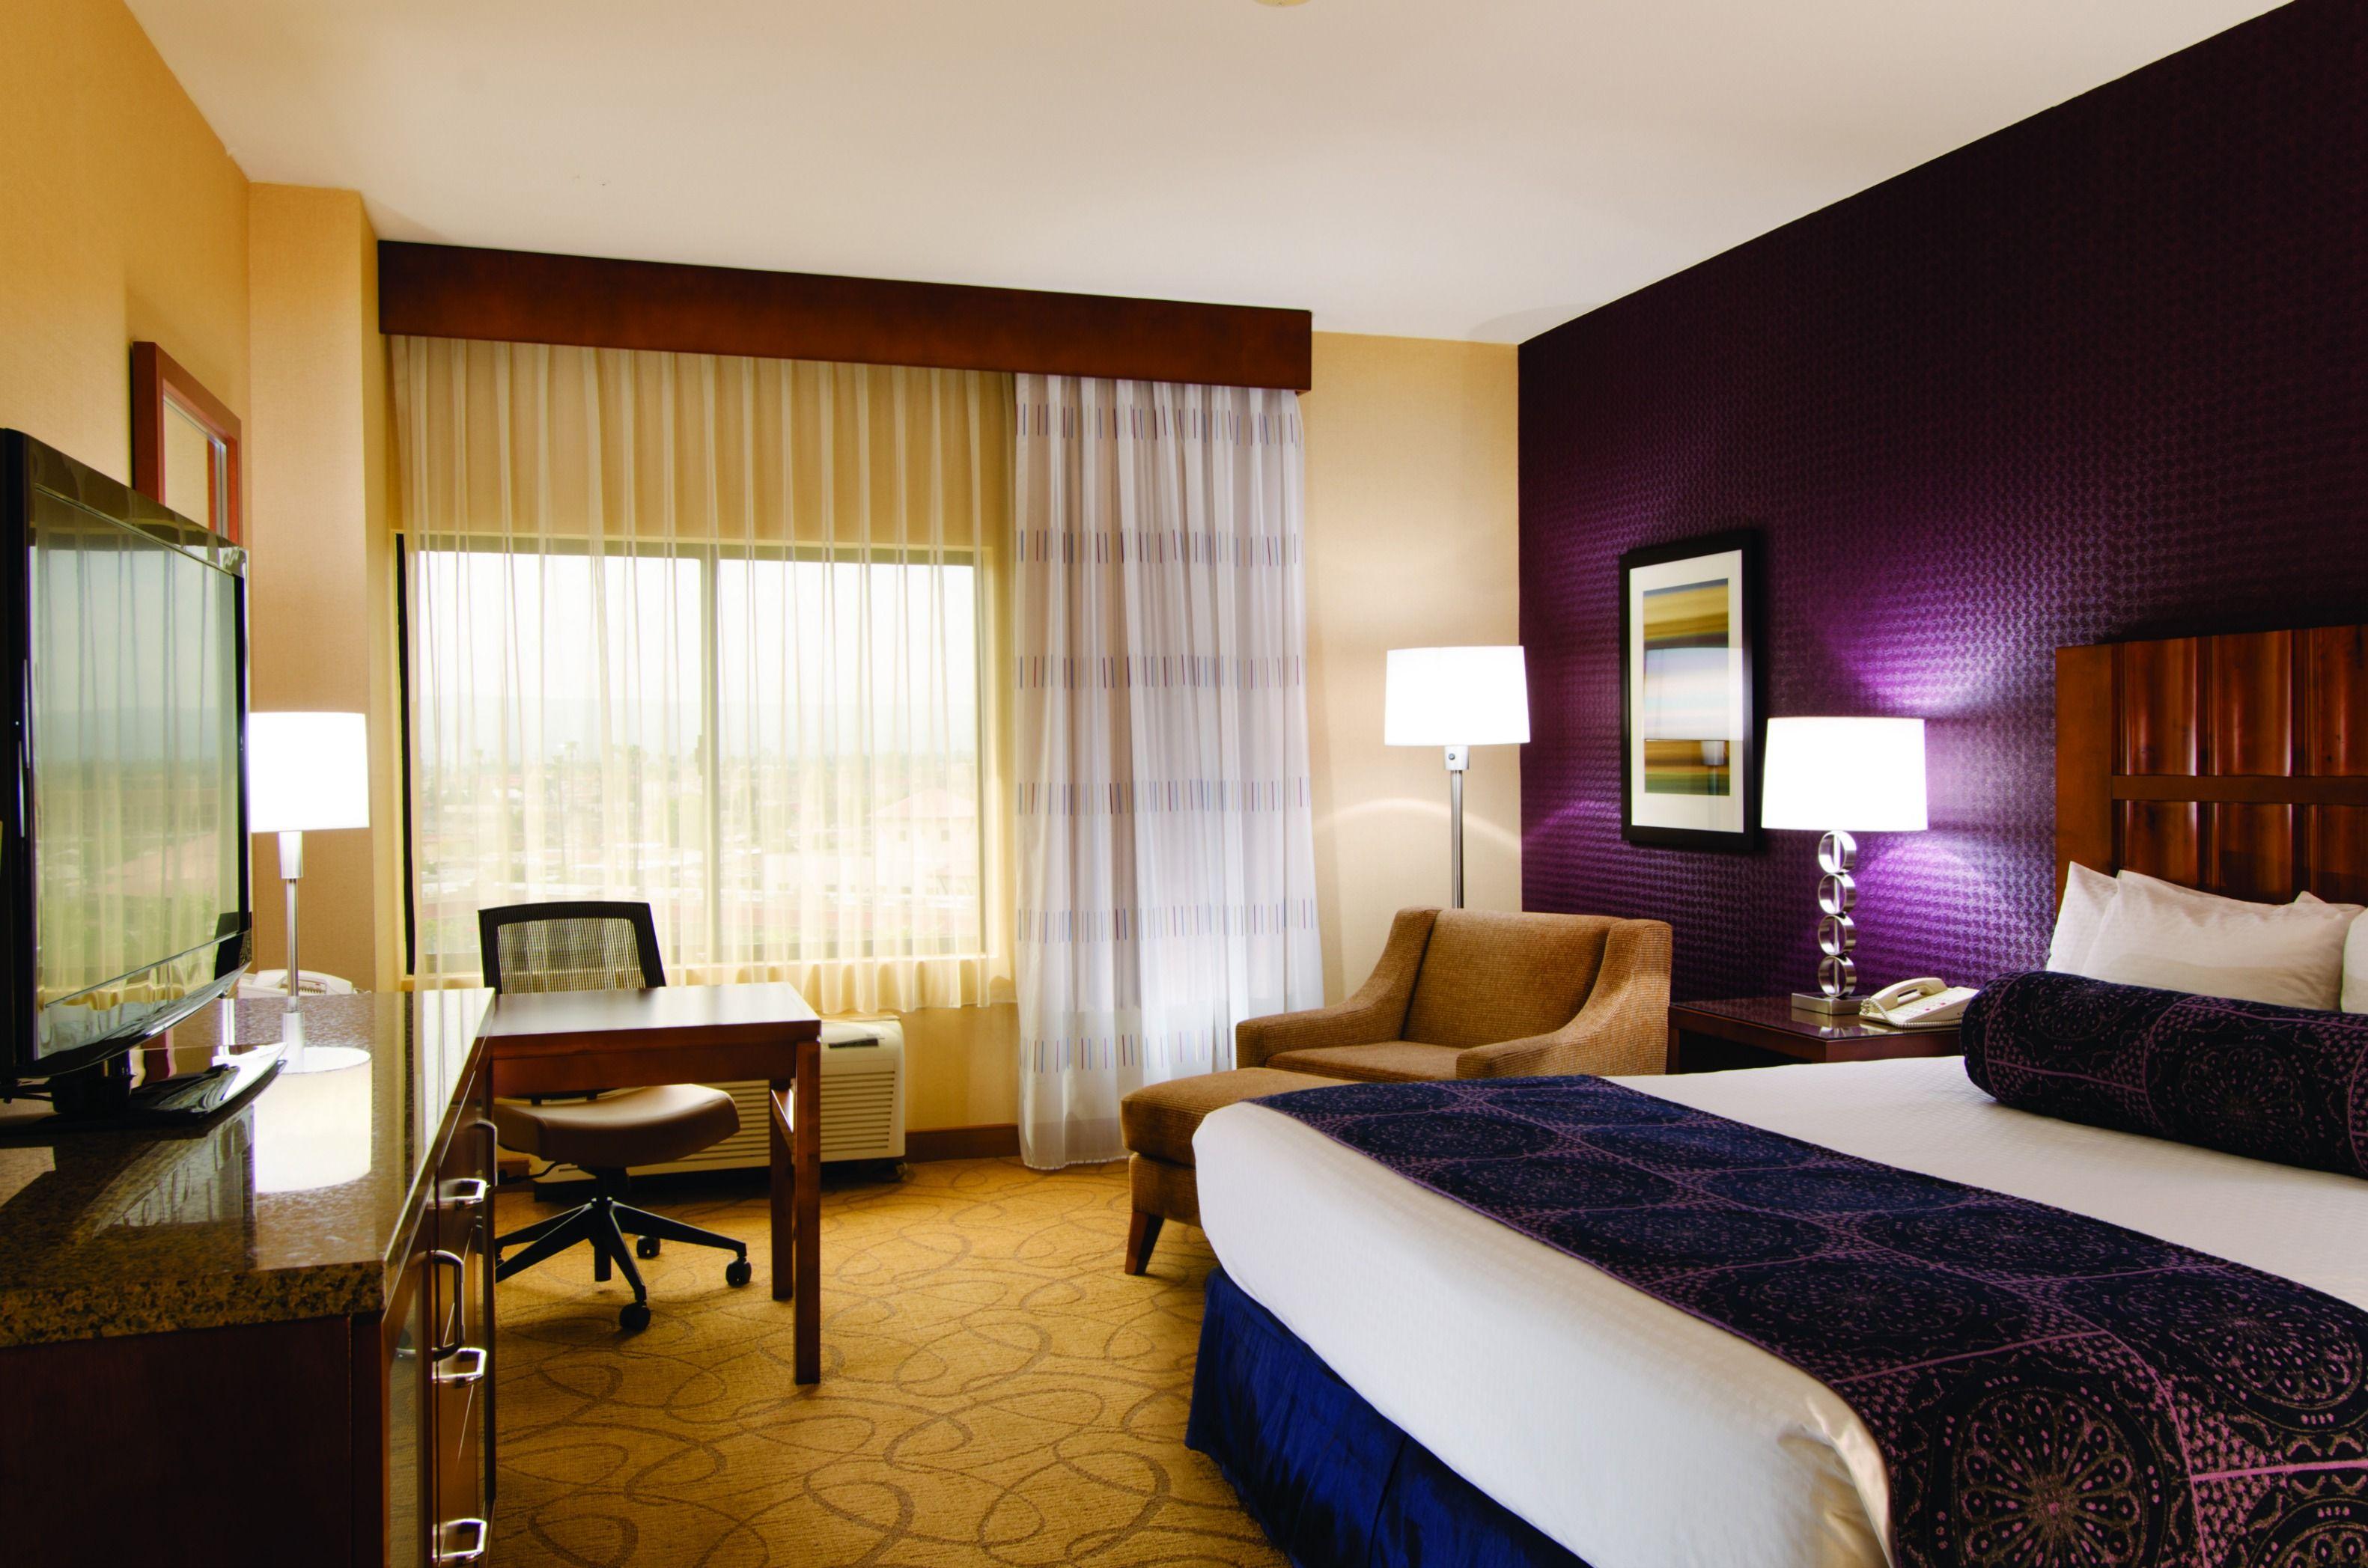 Doubletree By Hilton Hotel Carson Hilton Hotel Hotel Hotels Room